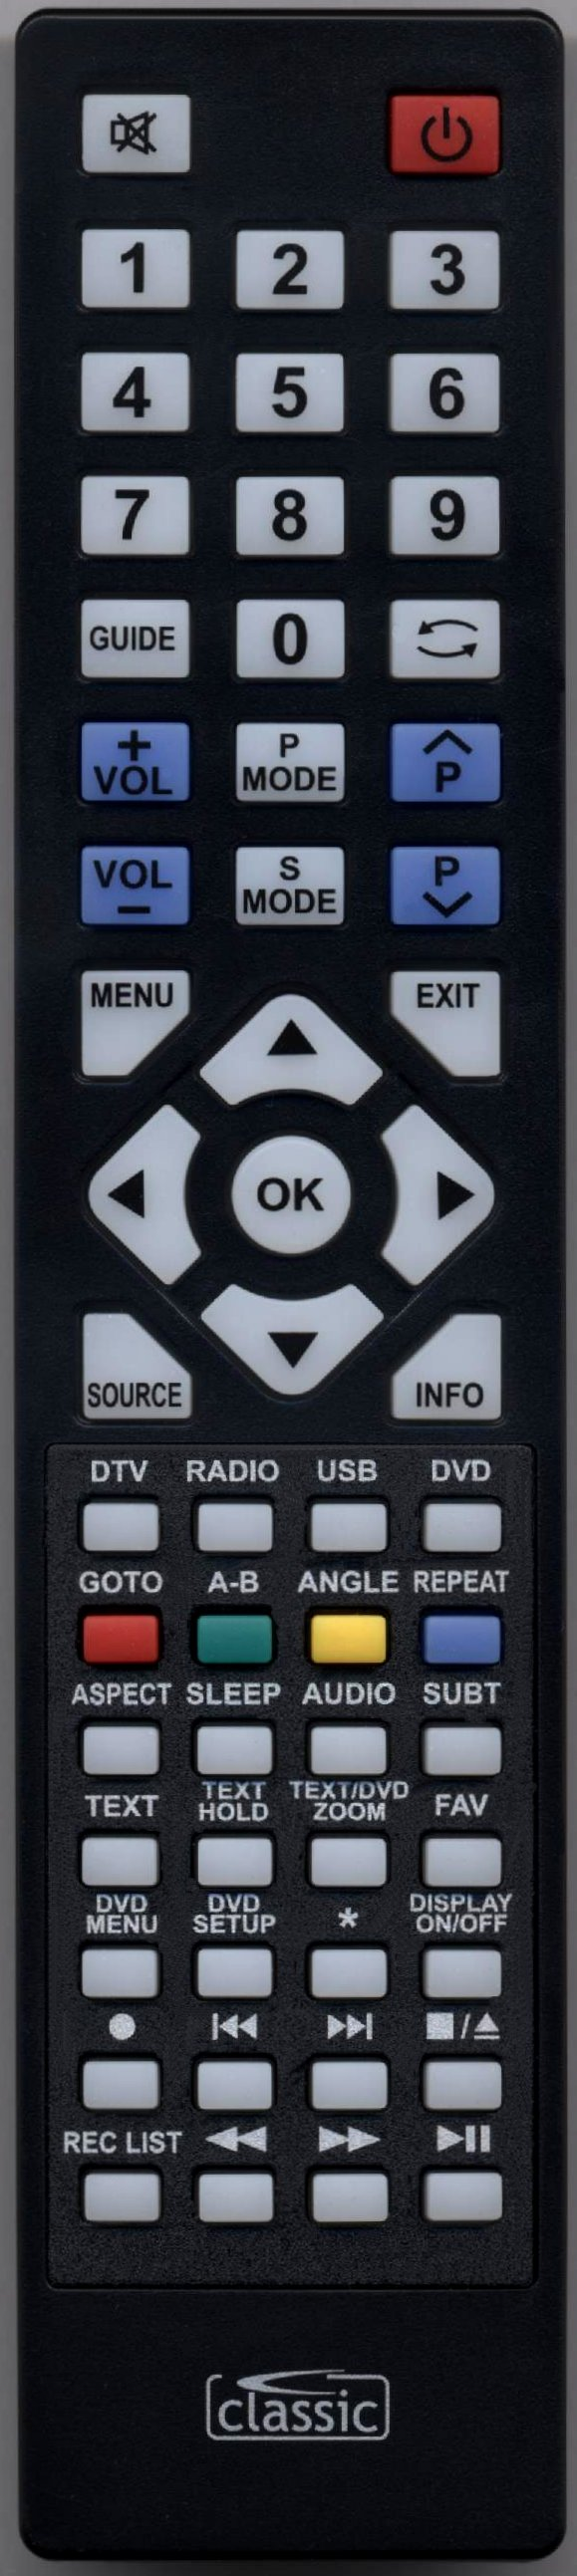 BLAUPUNKT 40/148Z-GB-11B-FGU-UK Remote Control Alternative